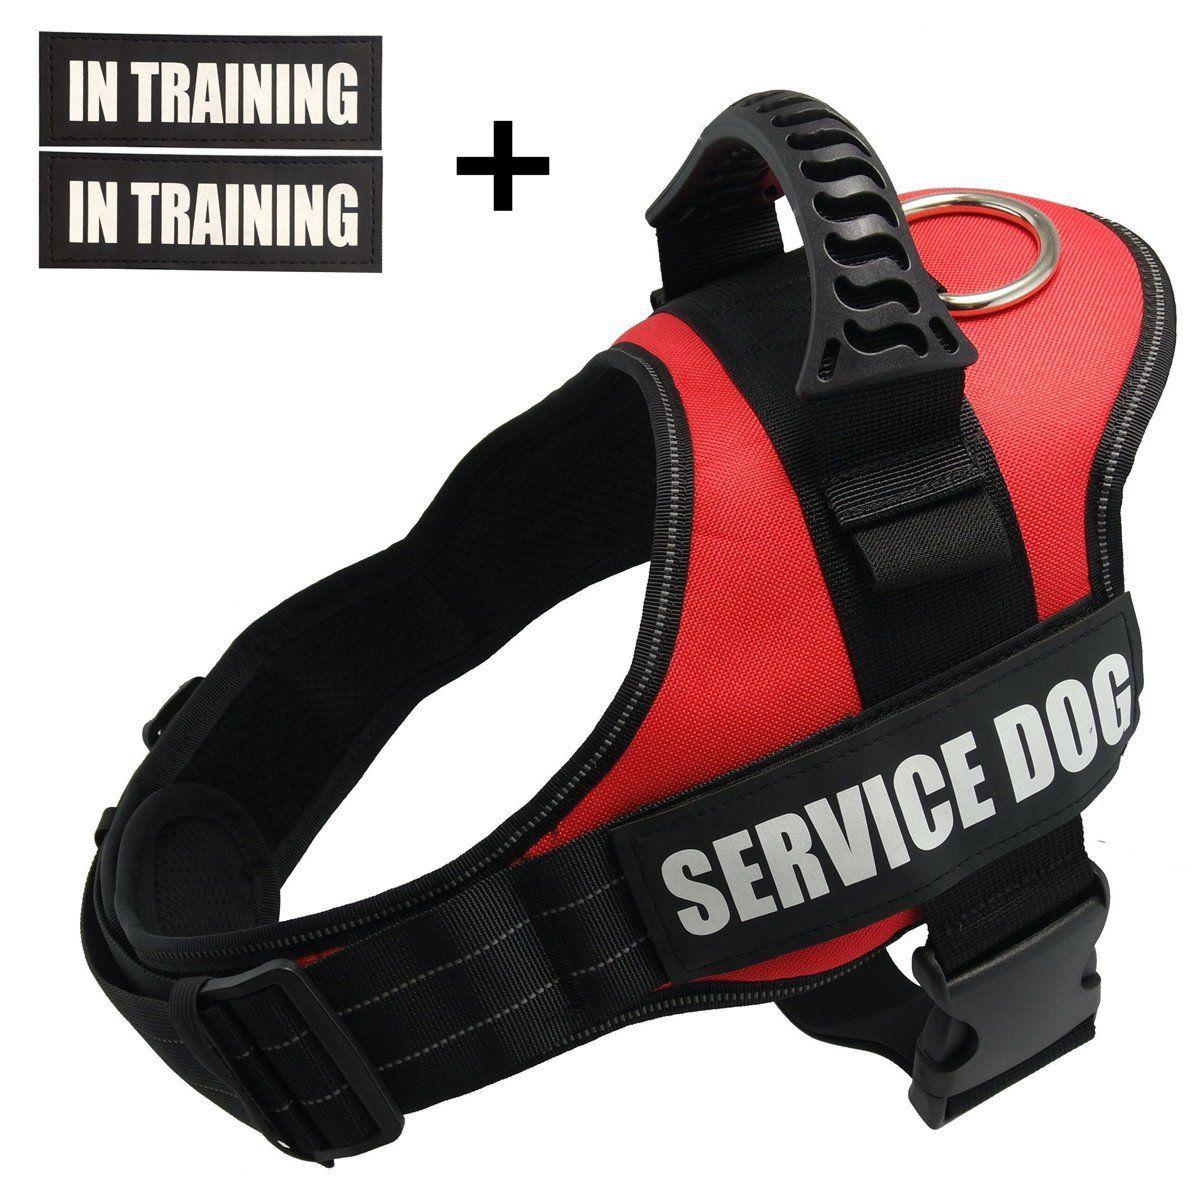 TOPPLE Servcie dog In Training Vest HarnessReflective